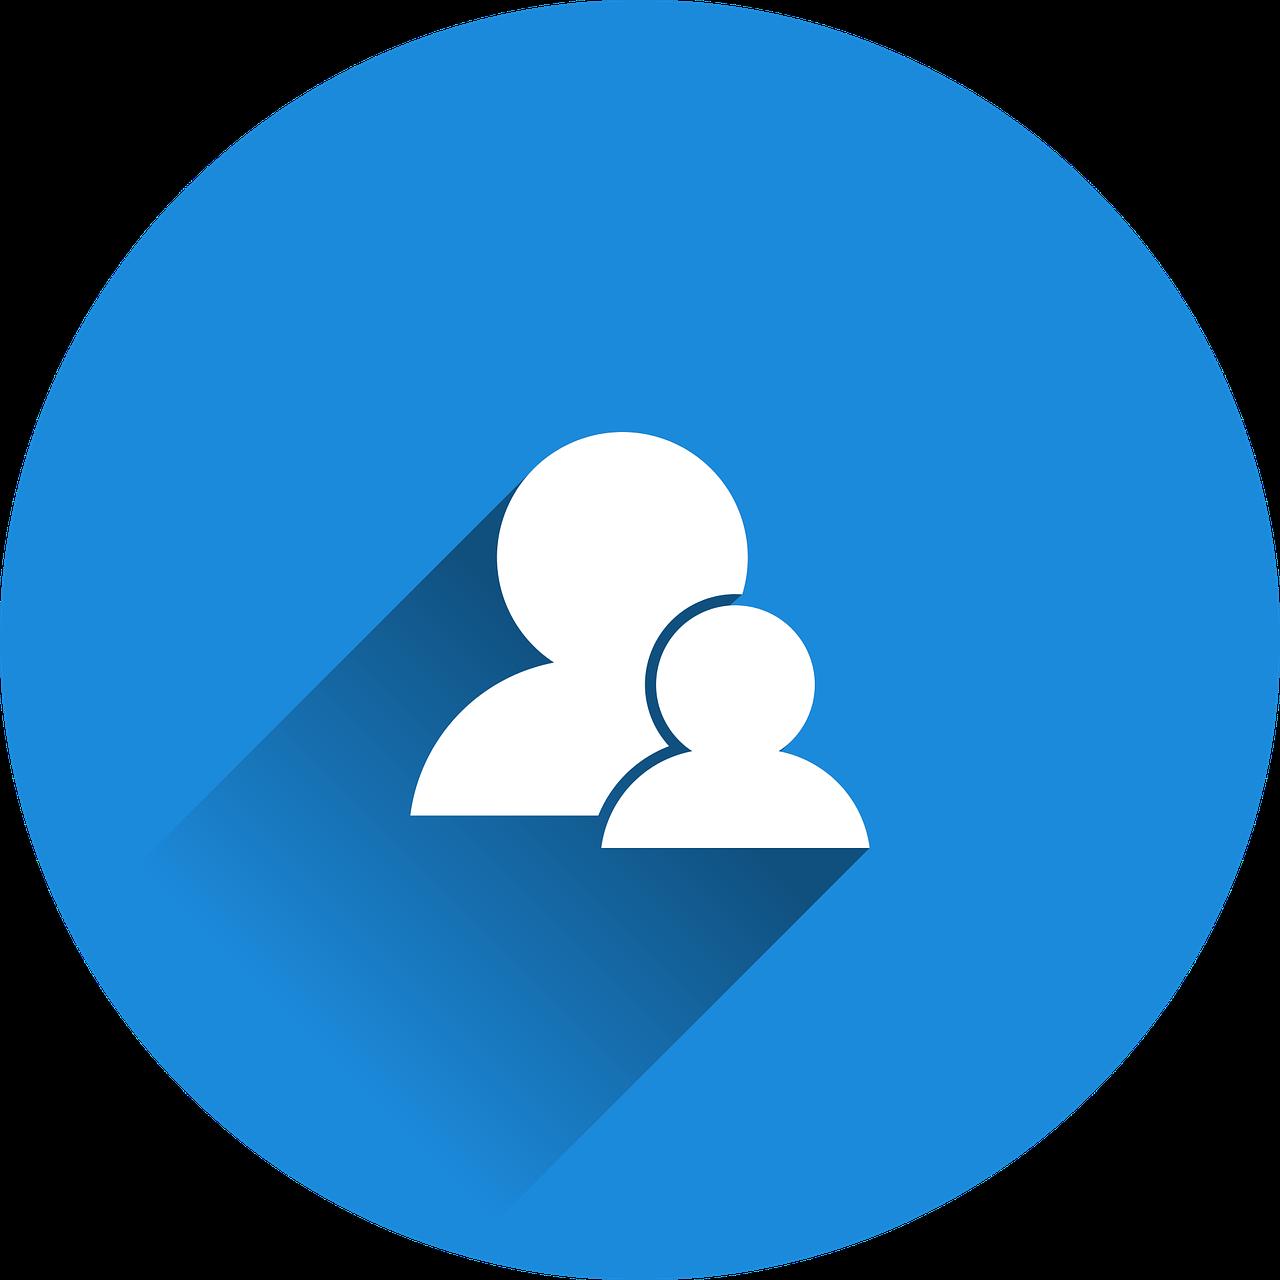 pair work icon